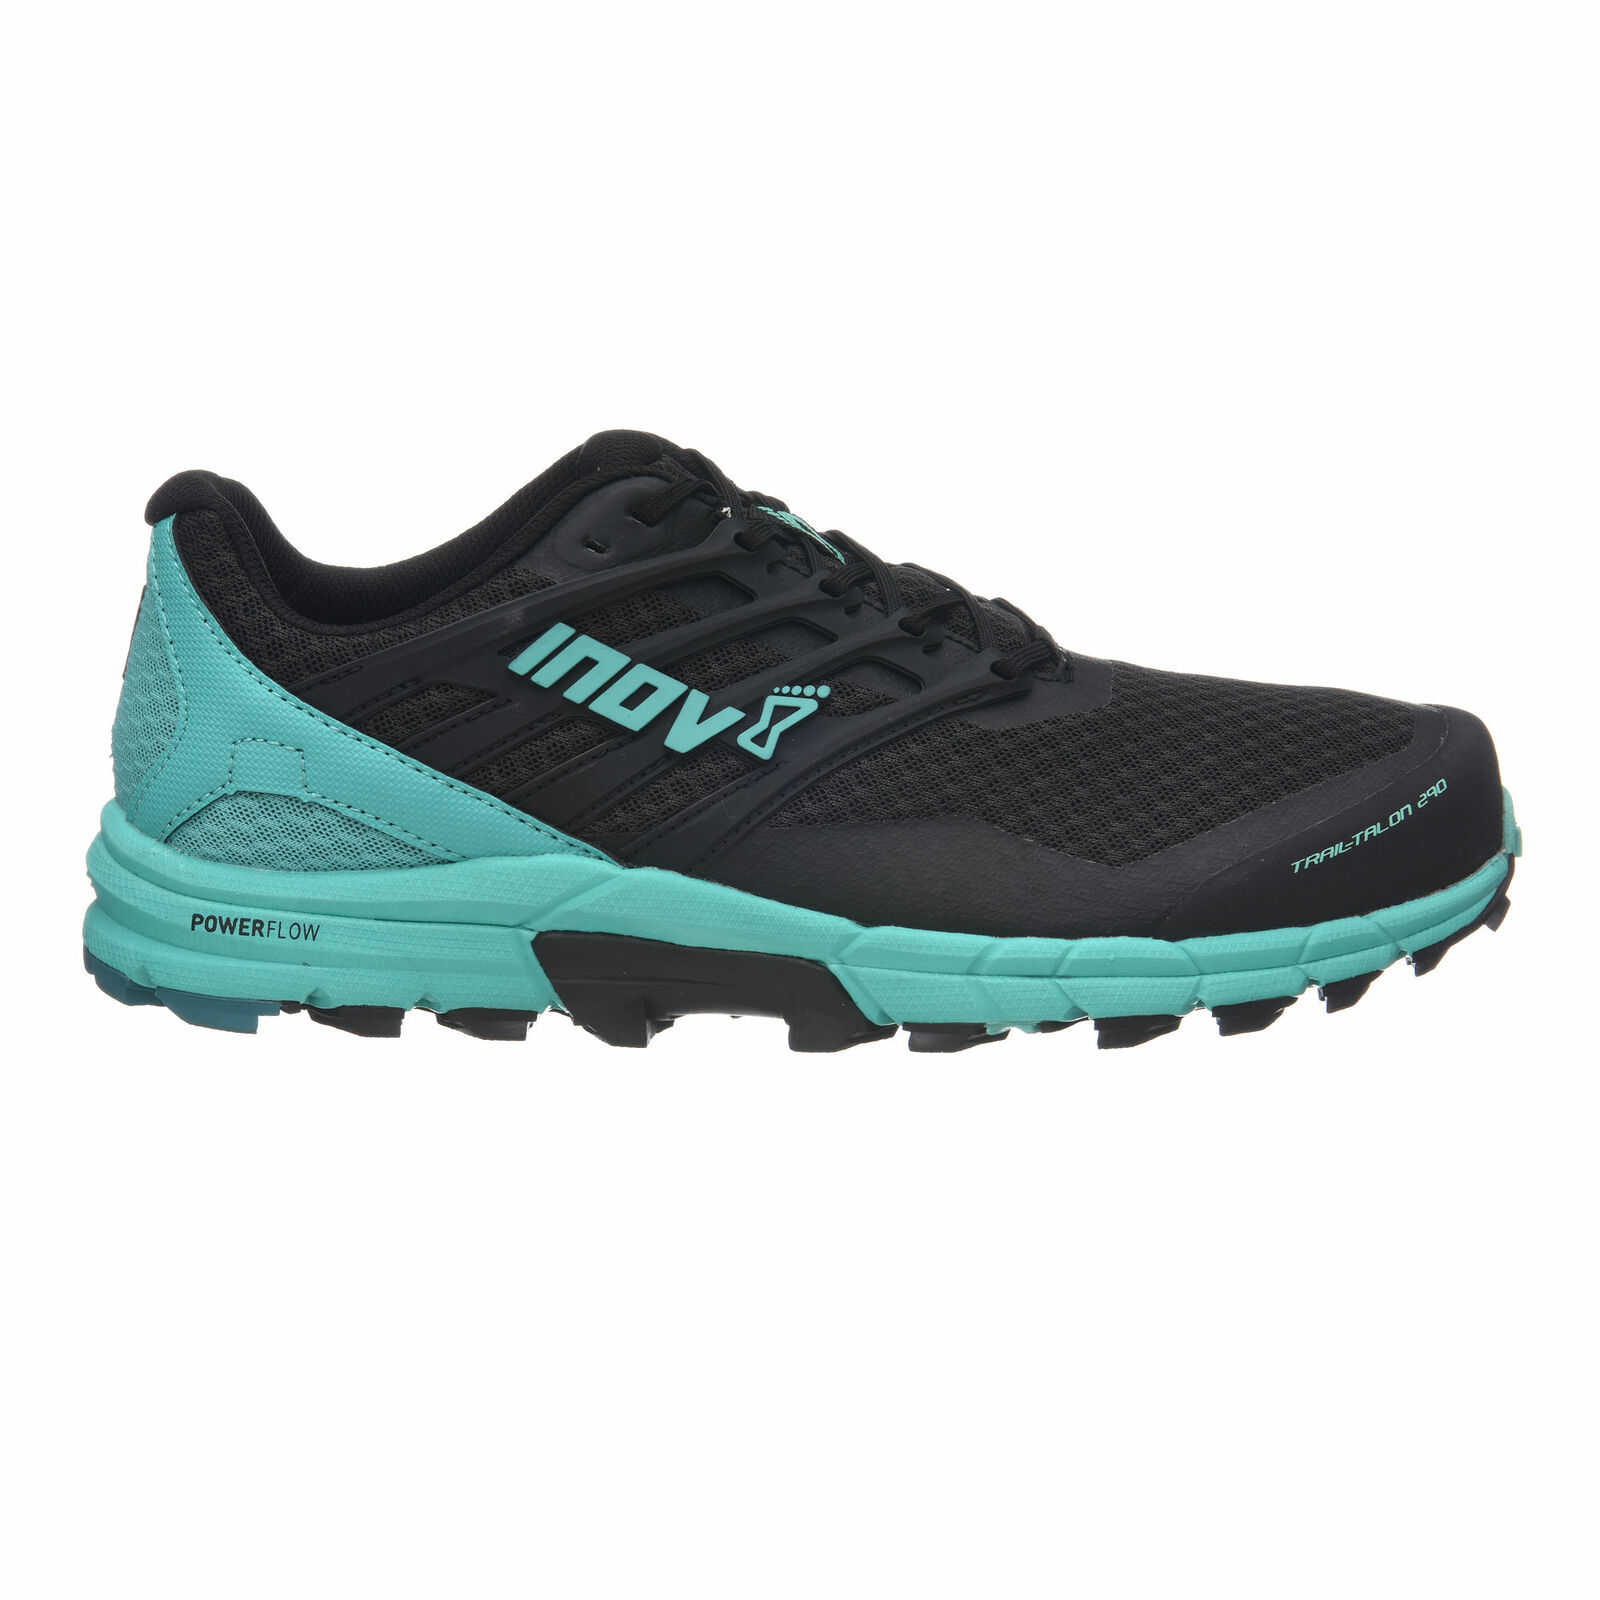 Inov 8 para mujer trailtalon 290 Trail Corriendo zapatos Trainers Negro y verde azulado